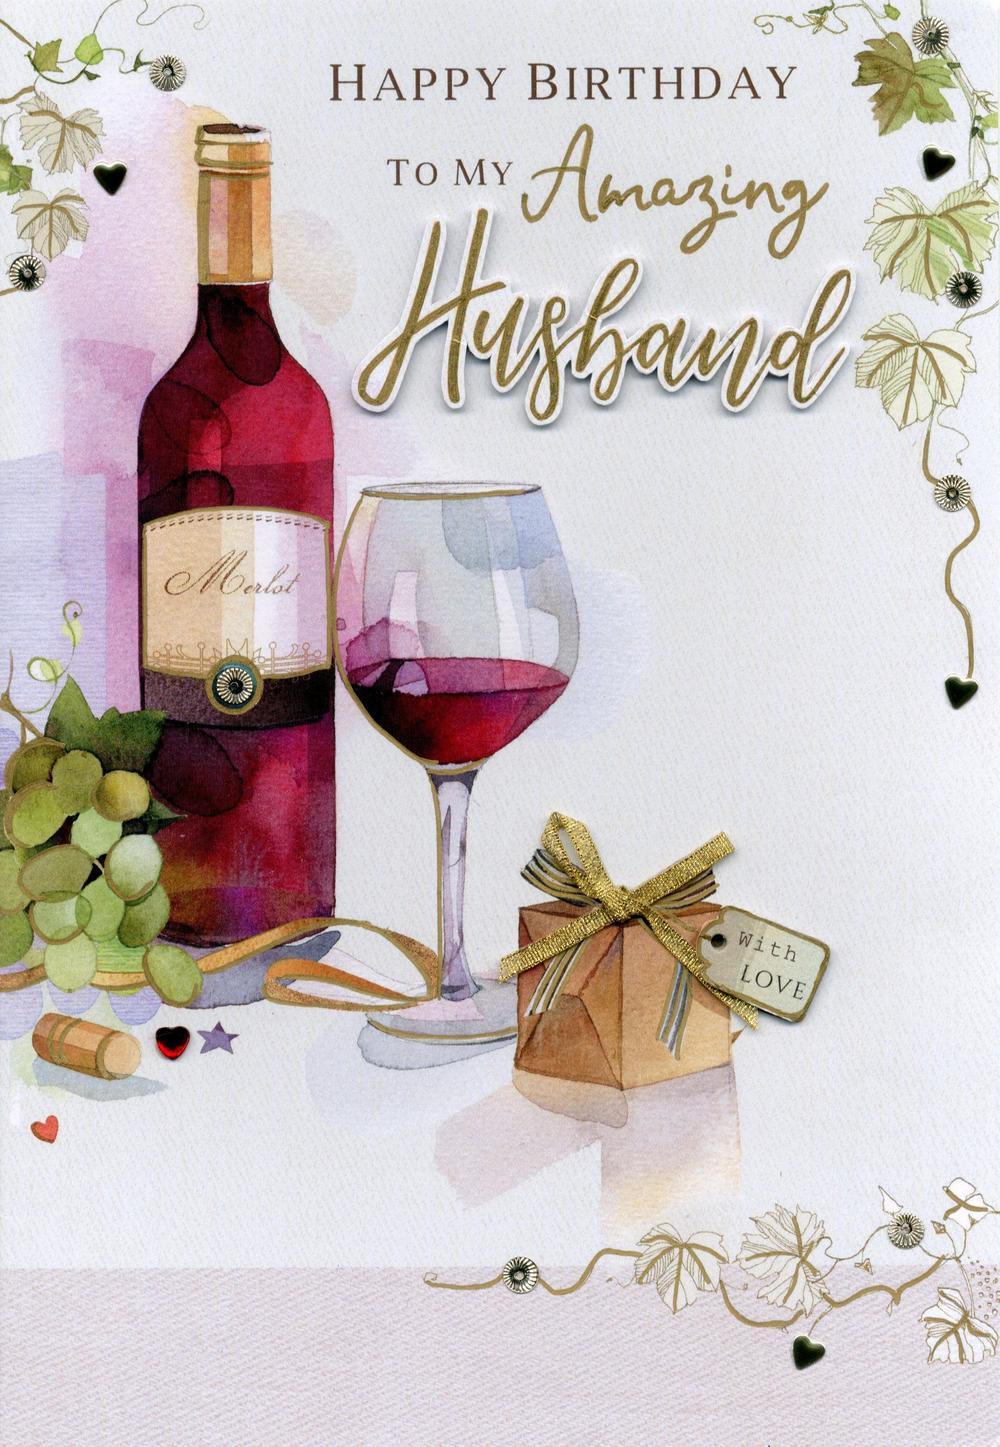 Magnifique Amazing Husband Birthday Greeting Card